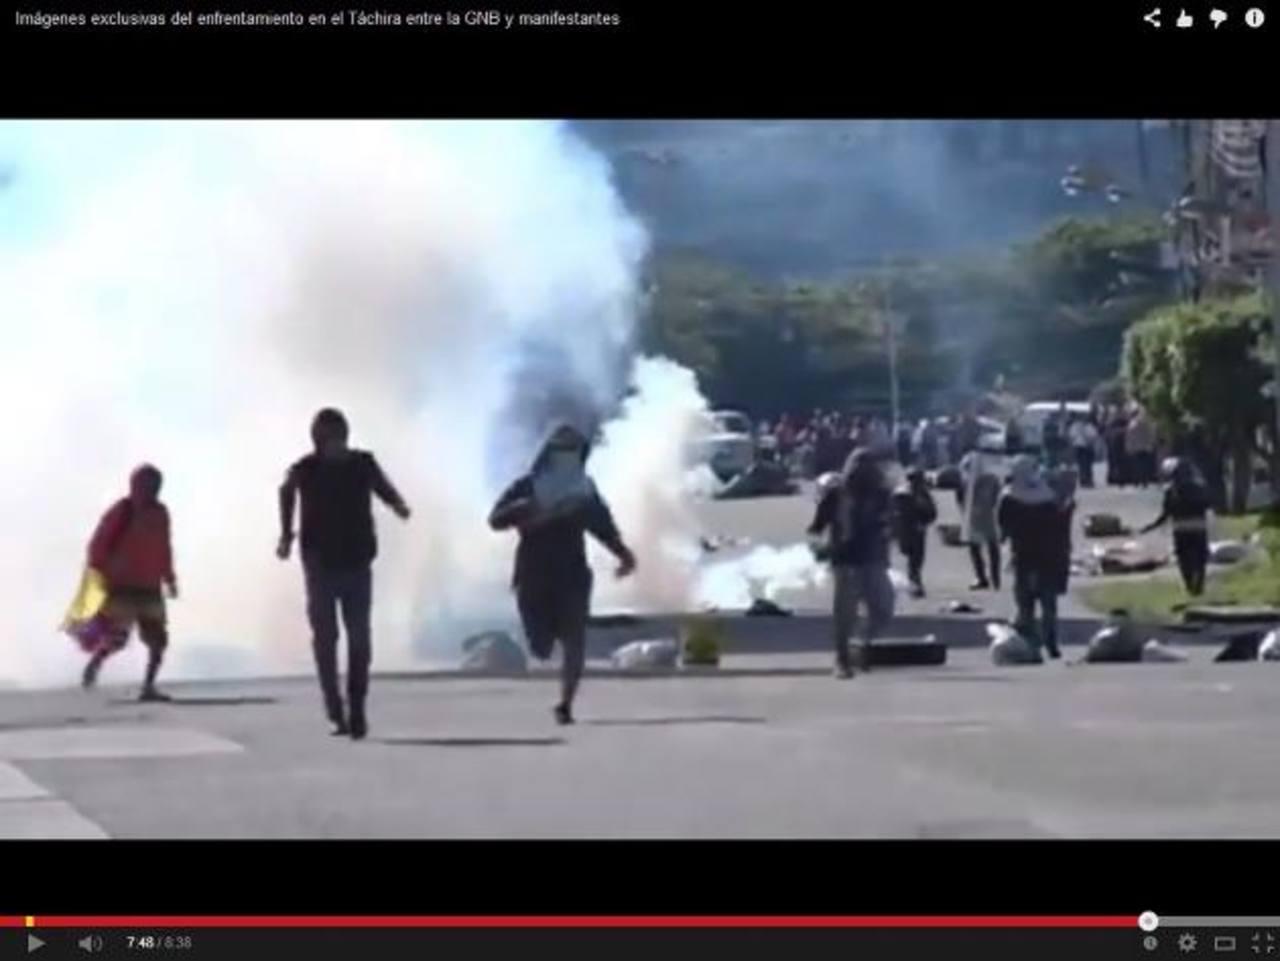 Manifestantes se enfrentan a la guardia chavista, en Táchira, para rechazar la nueva medida del régimen. foto edh / captura de youtube